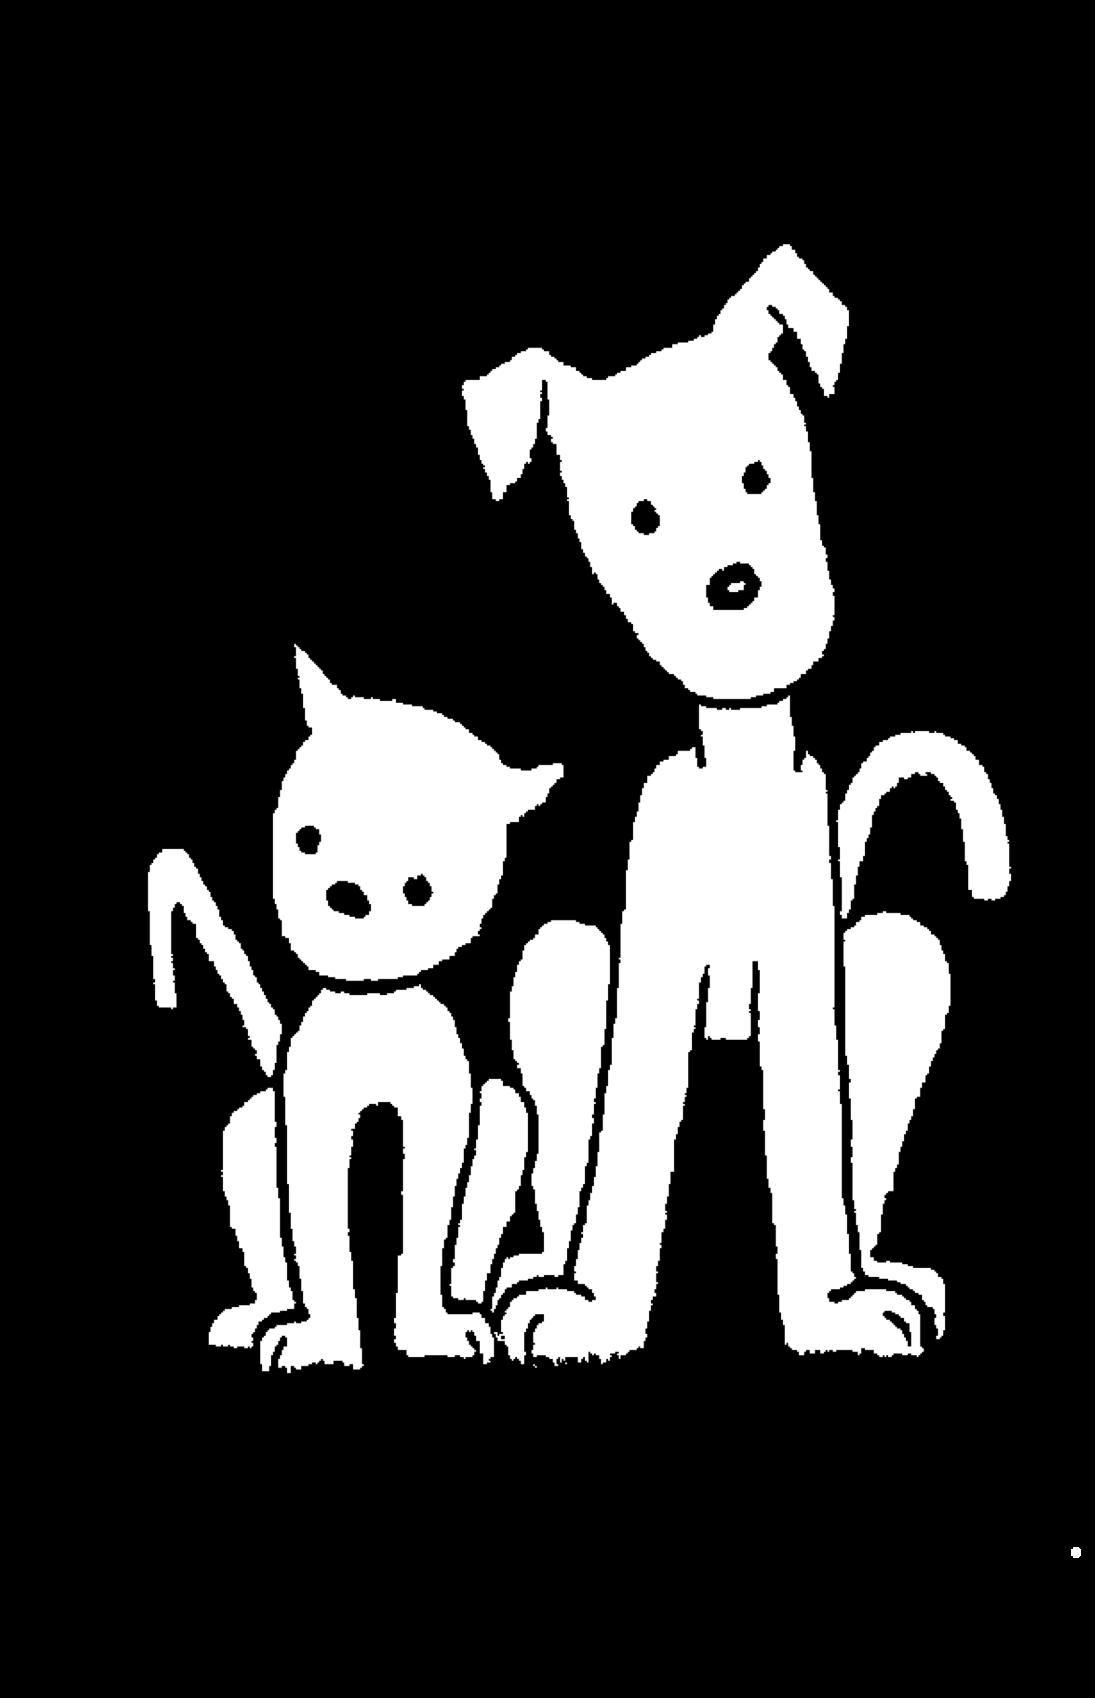 Gallery - Humane Society .-Gallery - Humane Society .-13